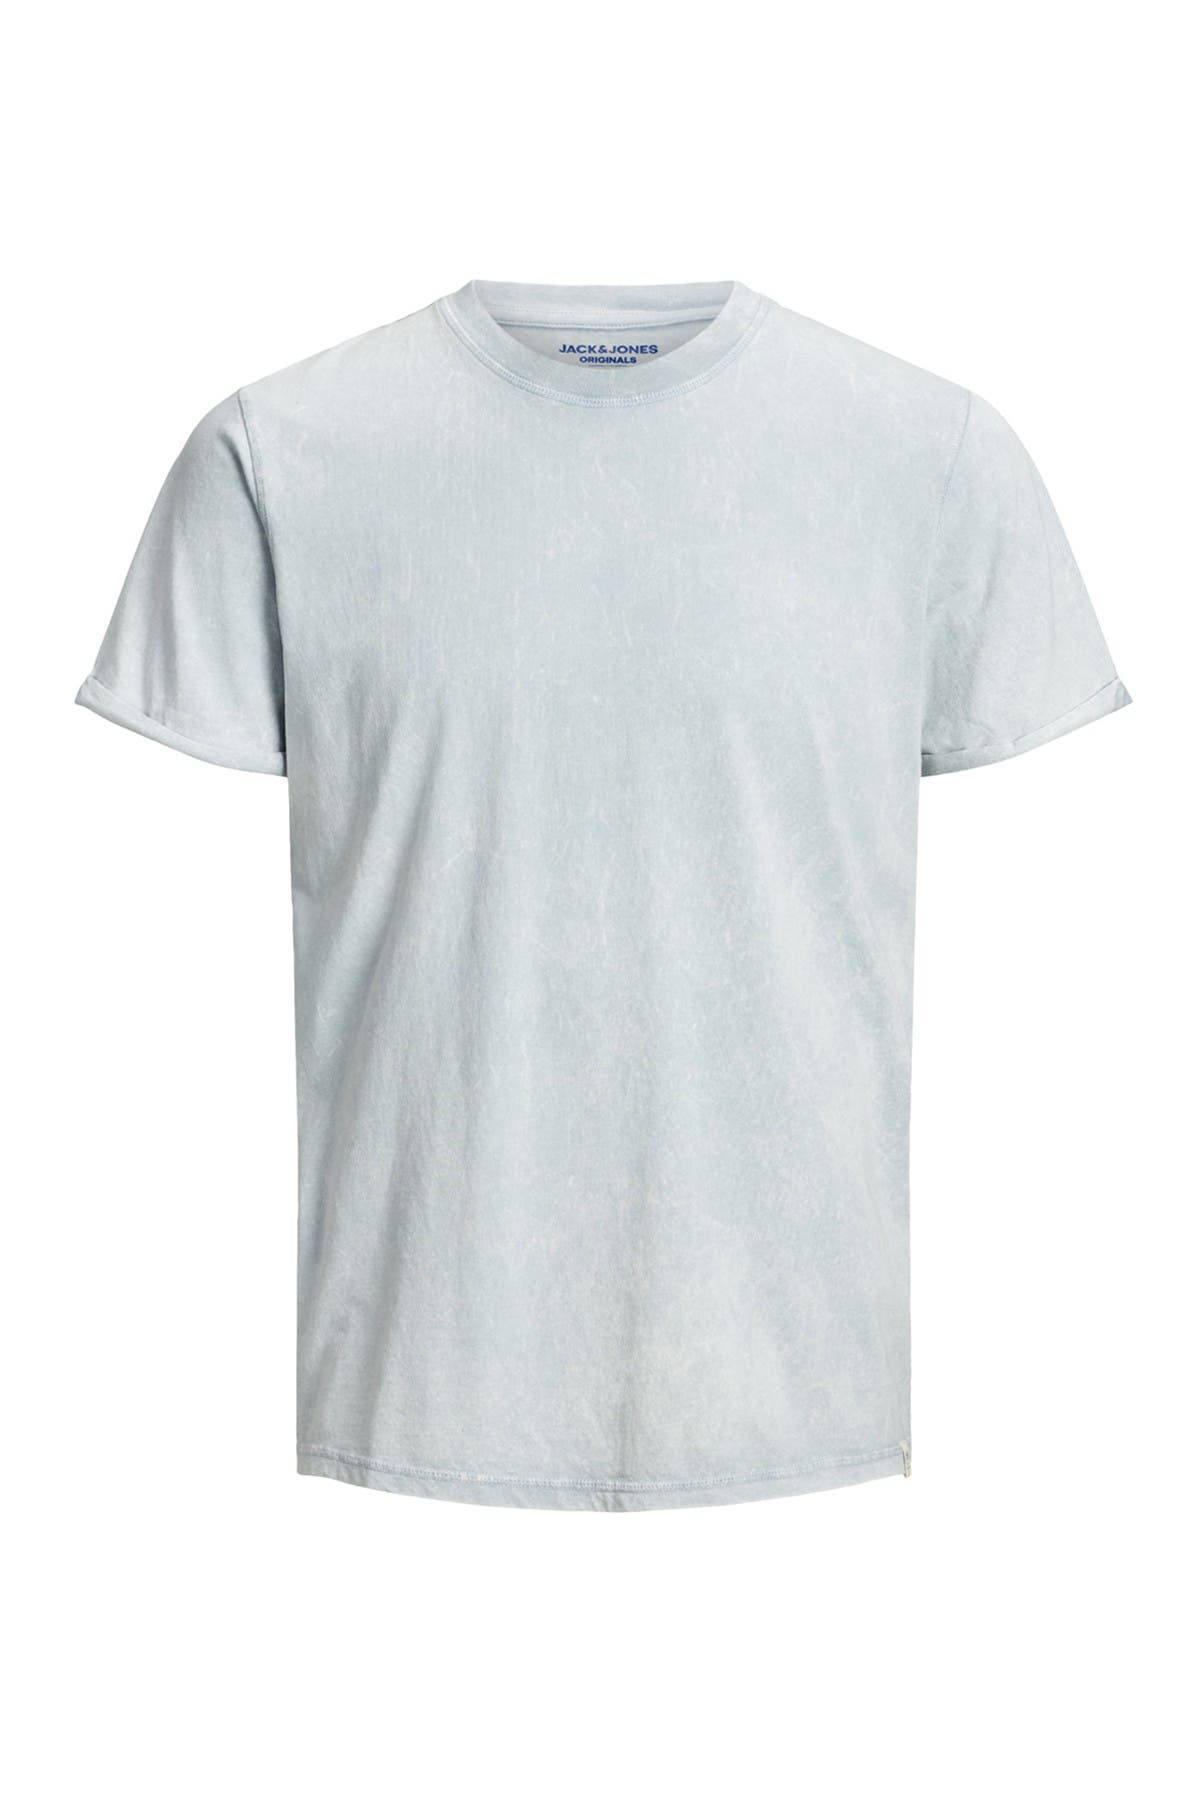 Image of JACK & JONES Level Crew Neck T-Shirt